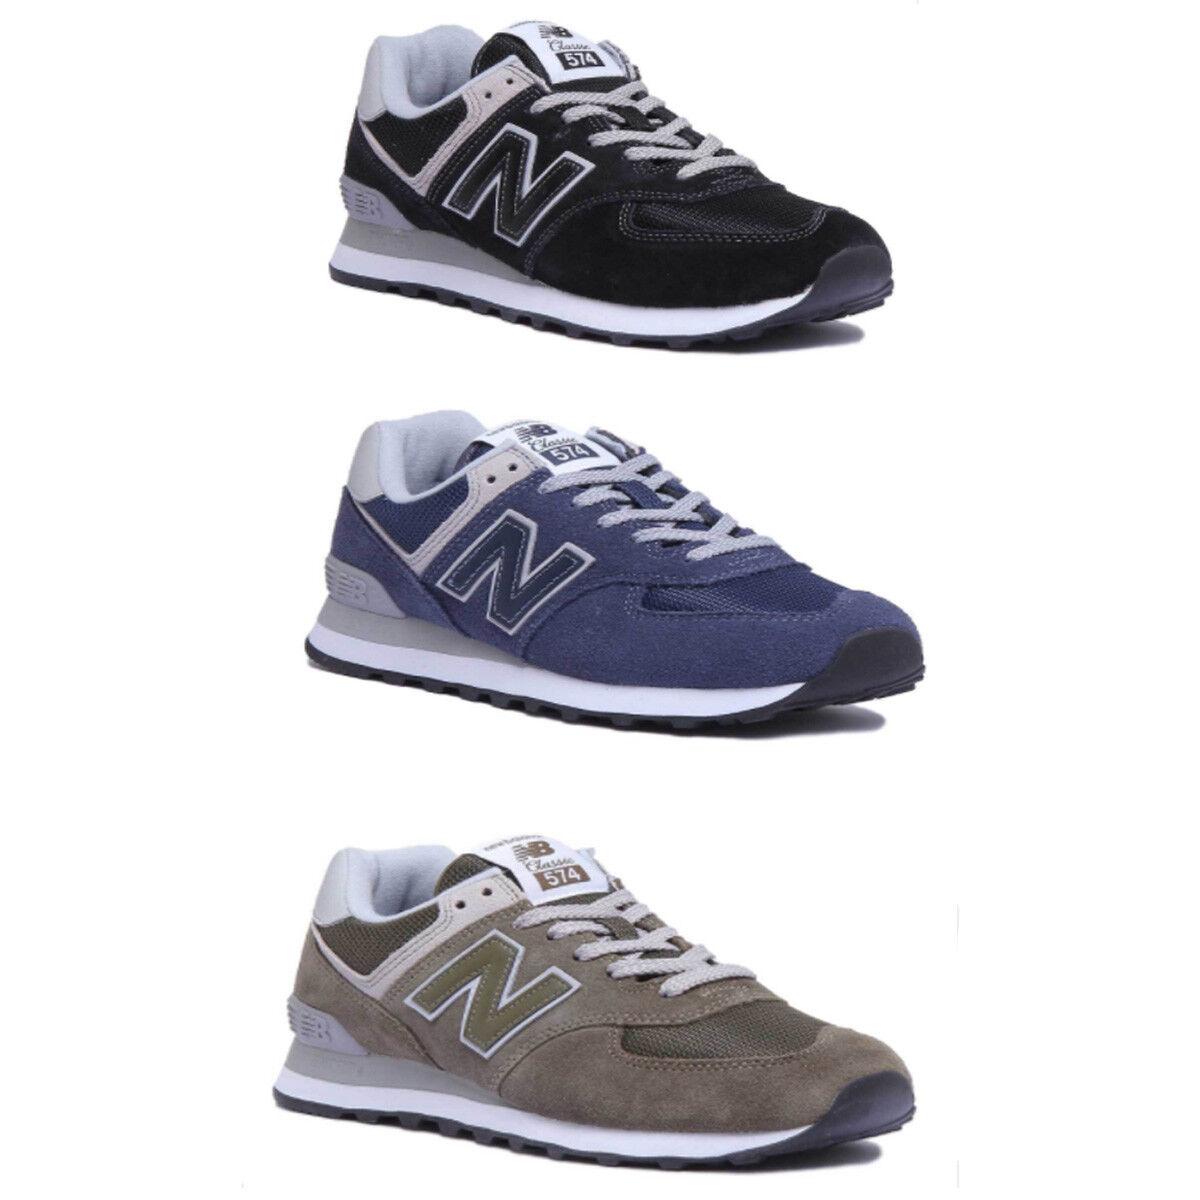 New Balance ML574EGN Vintage Classic Damen Laufschuhe Fitness Sneaker Sport Turn